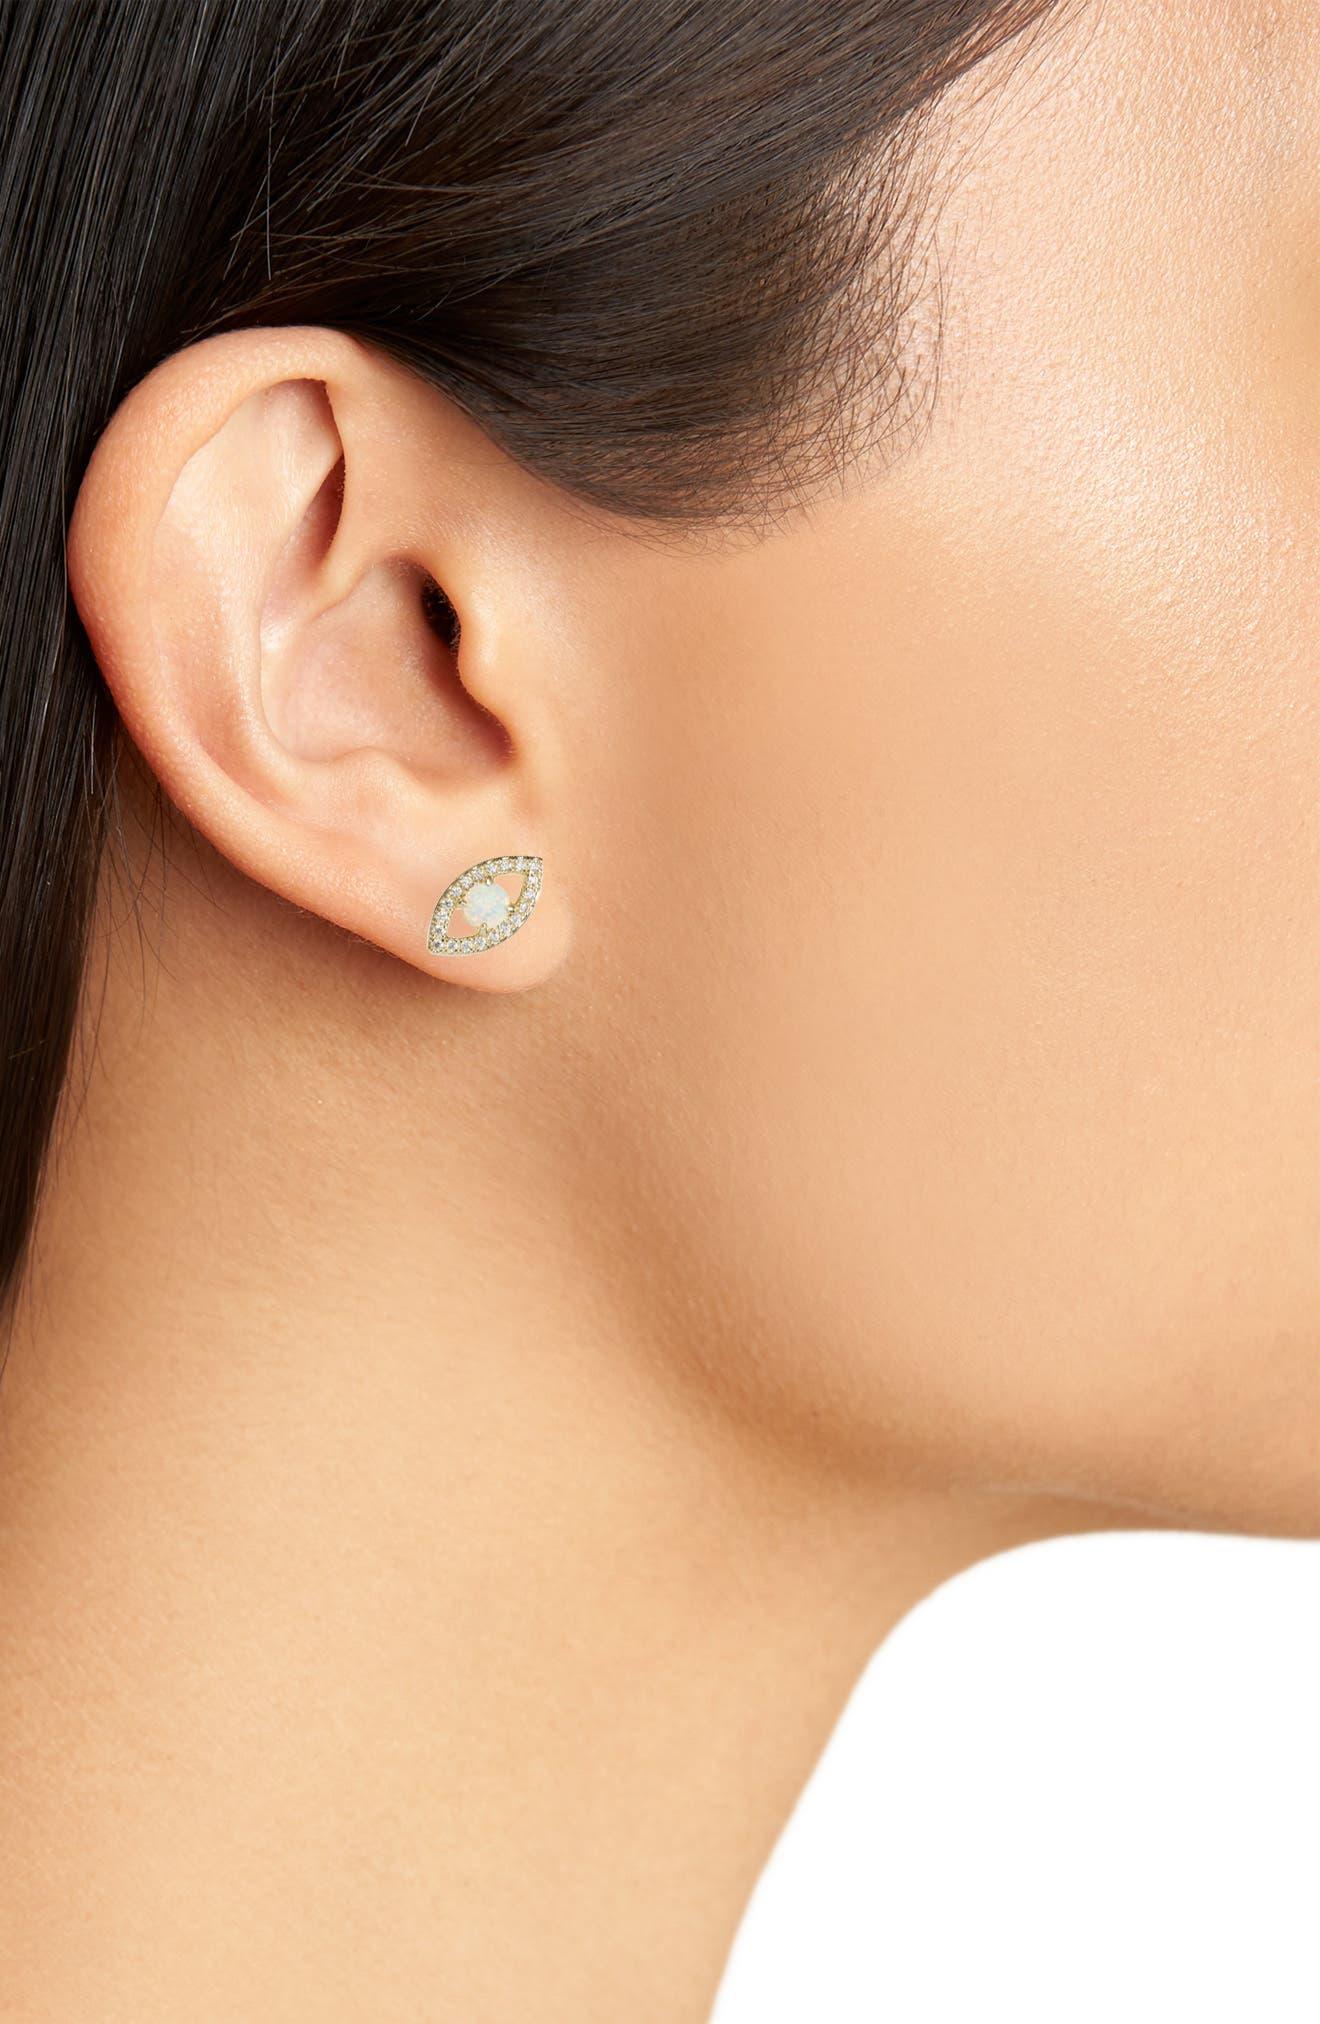 MELINDA MARIA, Evil Eye Stud Earrings, Alternate thumbnail 2, color, 710